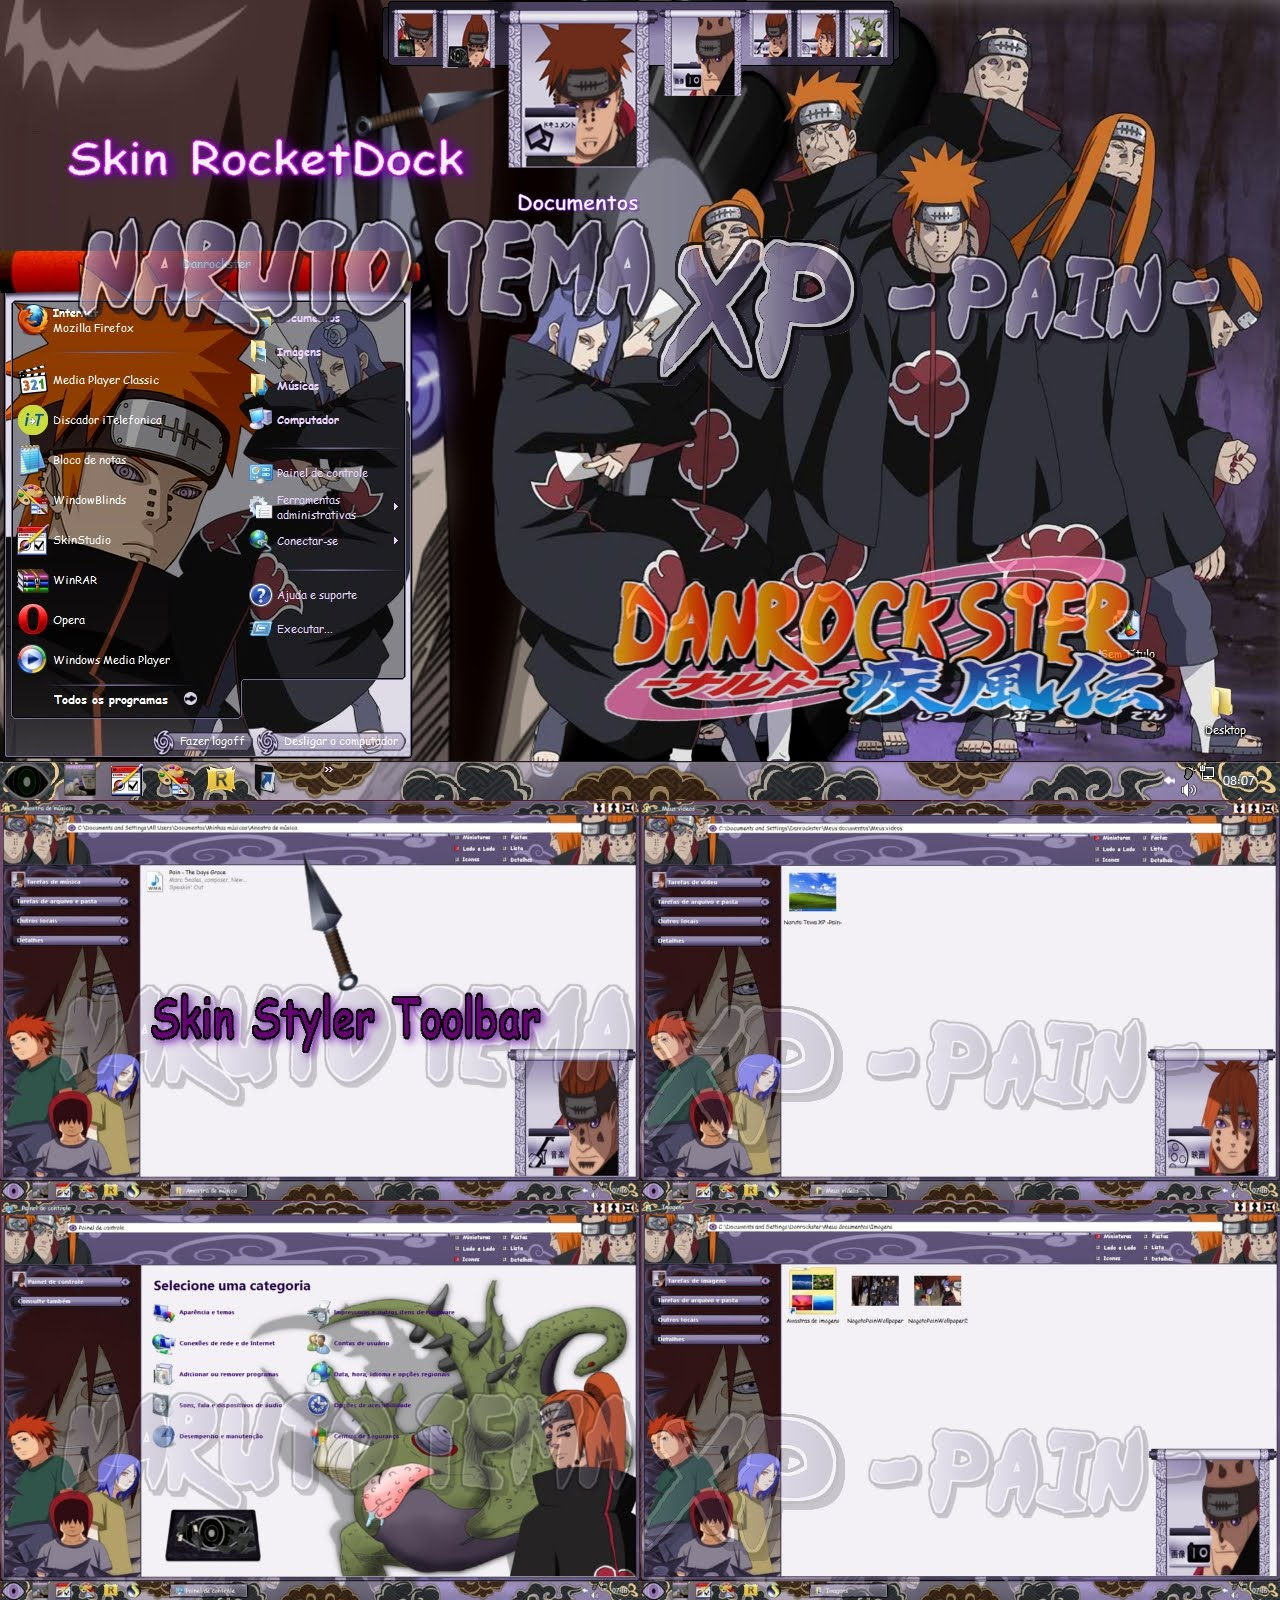 http://2.bp.blogspot.com/_cR4mwneFkoU/TIqc4CIh0JI/AAAAAAAAAB8/yhhIXuAVbIM/s1600/Naruto_Tema_XP__Pain__by_Danrockster.jpg